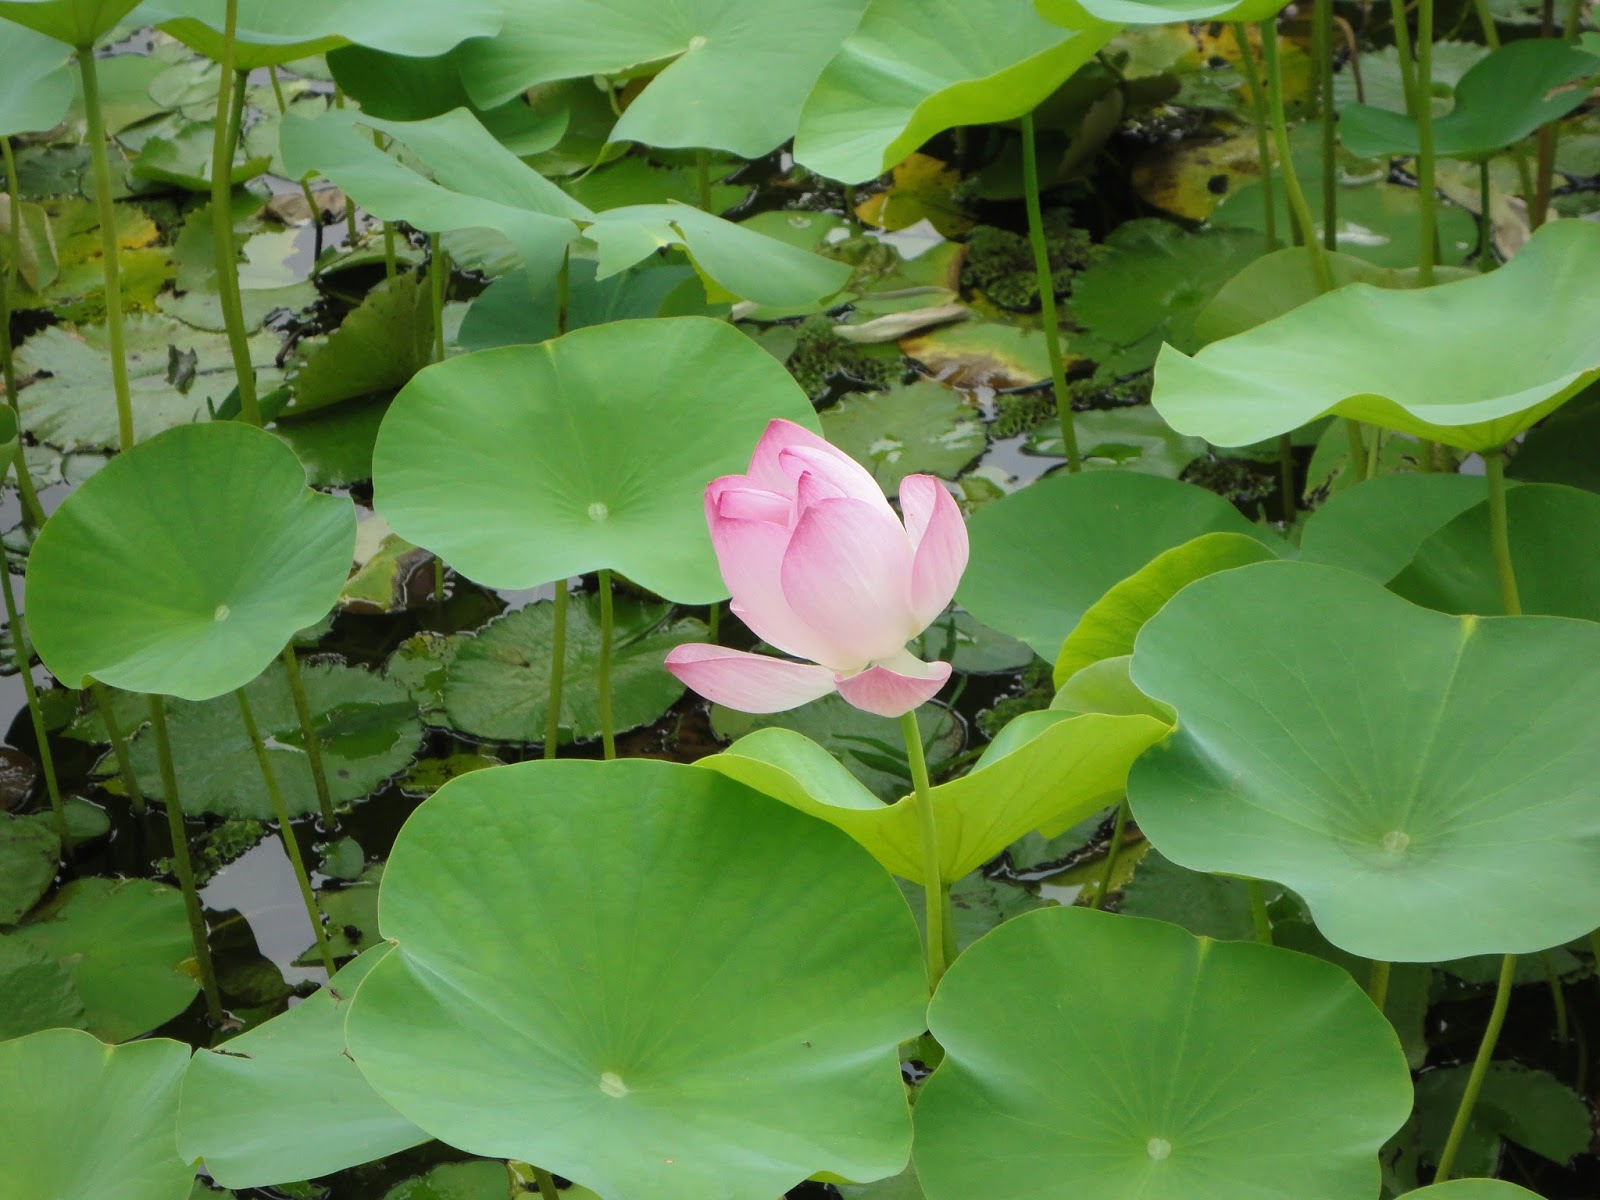 Padma lotus nelumbo nucifera common names padma poddo lotus indian lotus sacred lotus izmirmasajfo